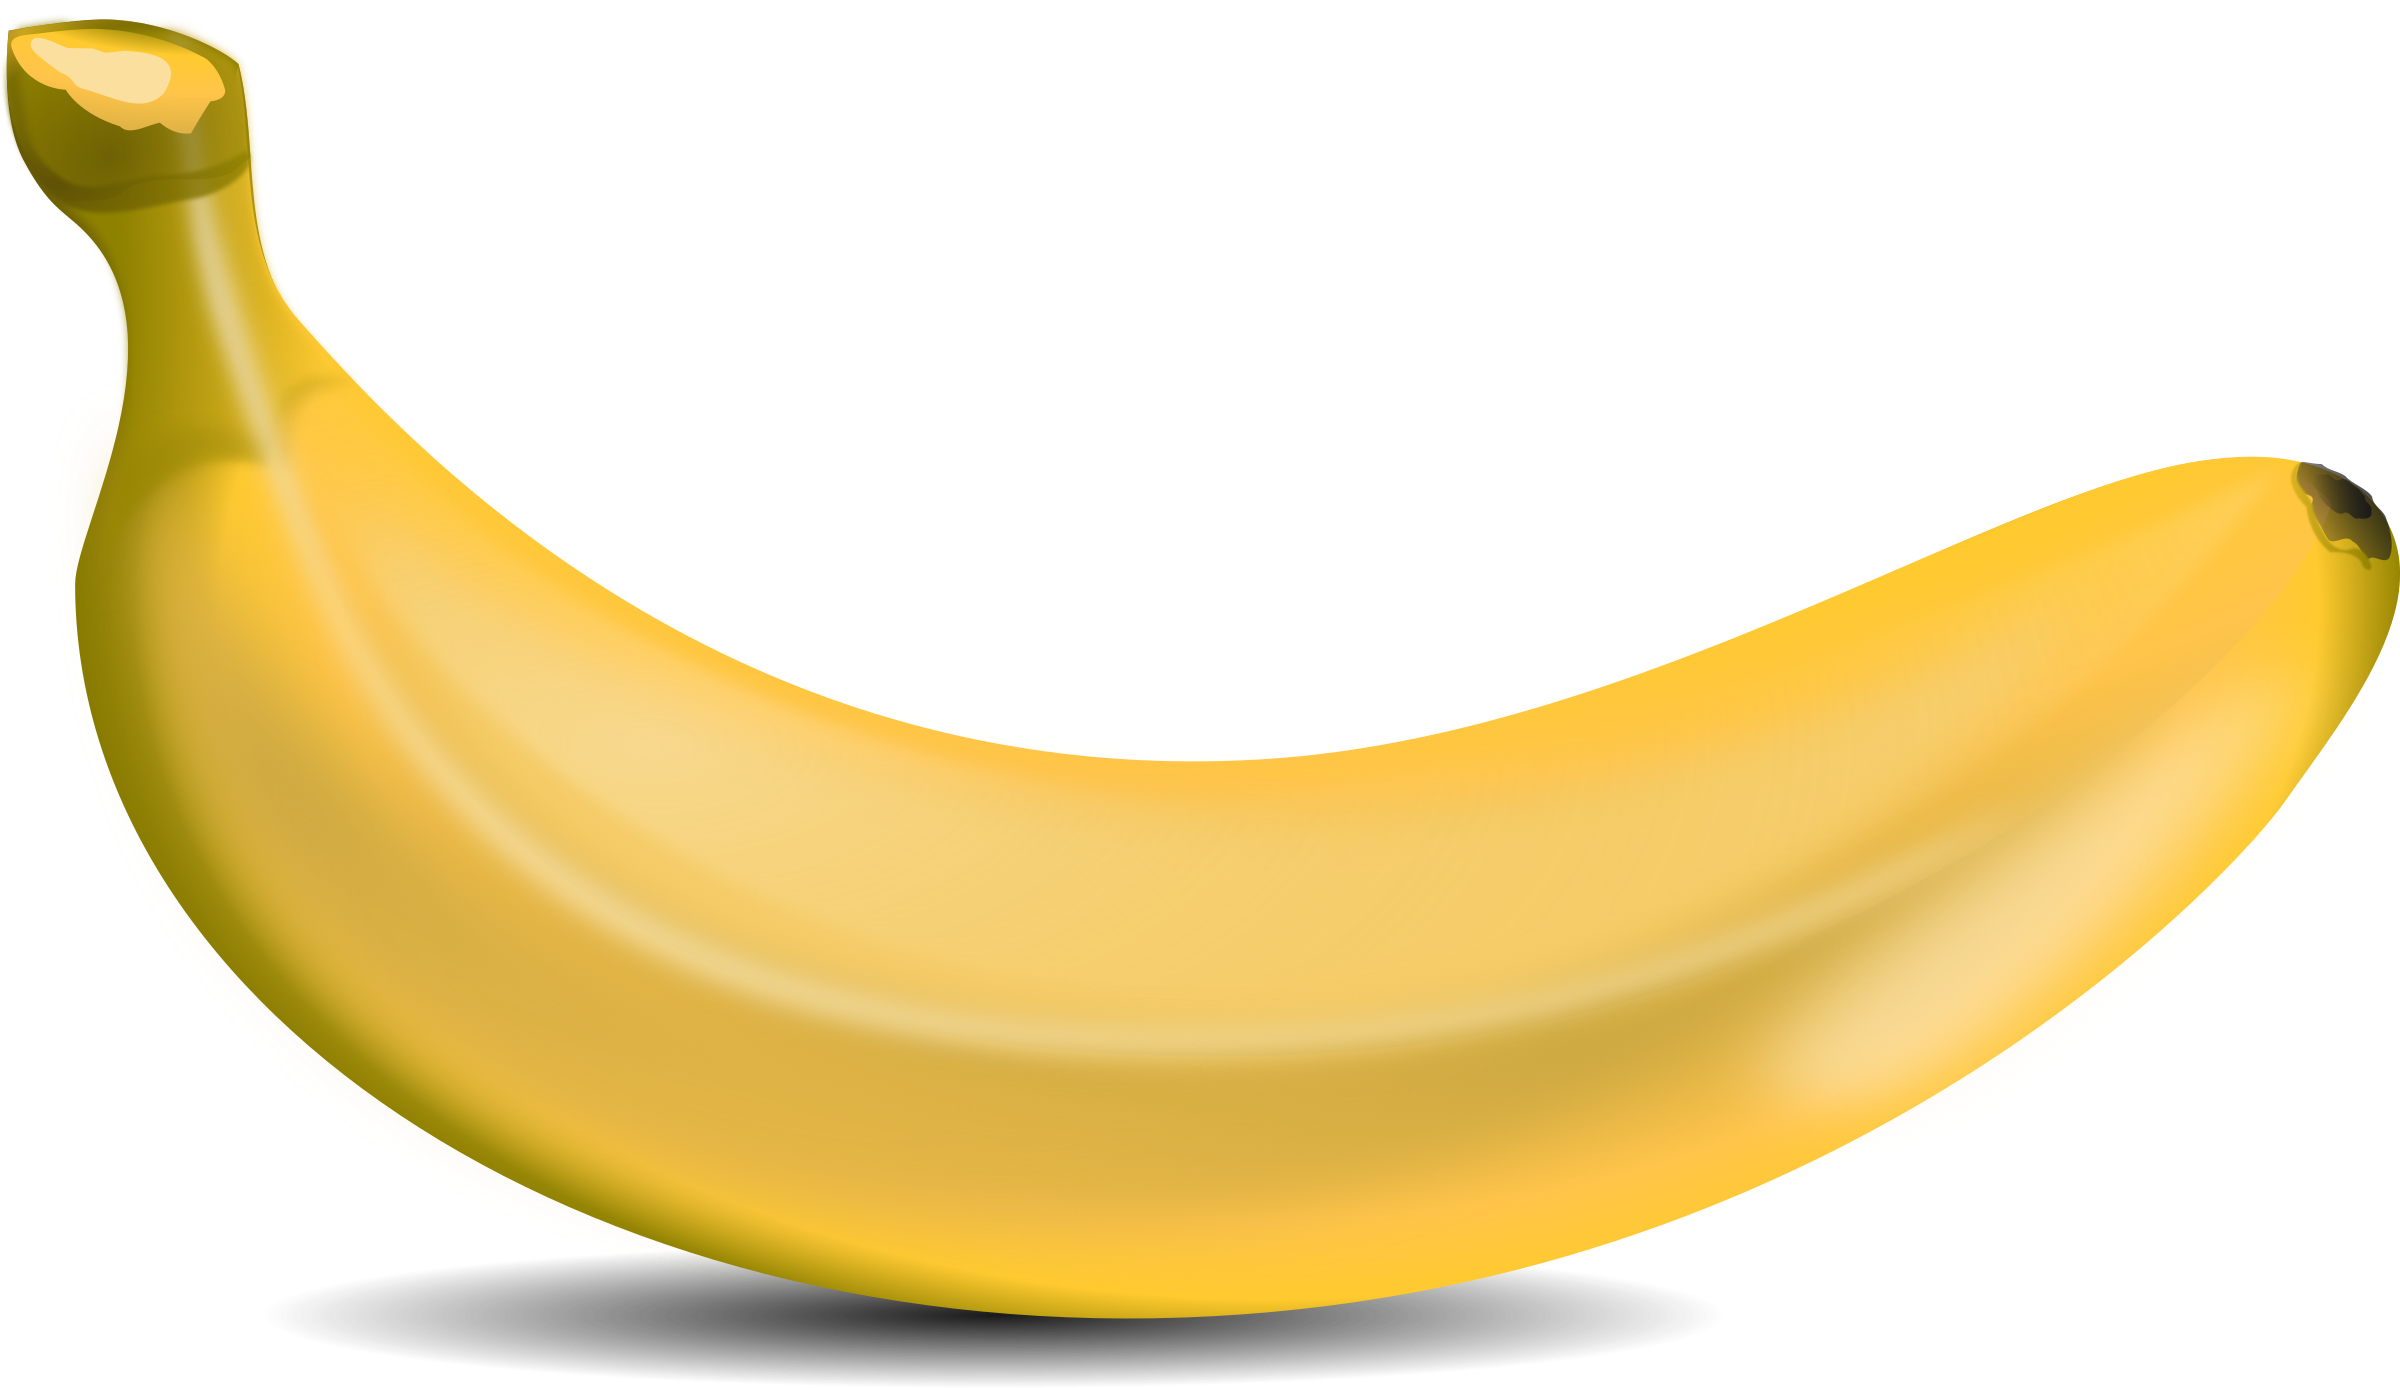 2400x1388 Banana Clip Art Free Png Png Mart